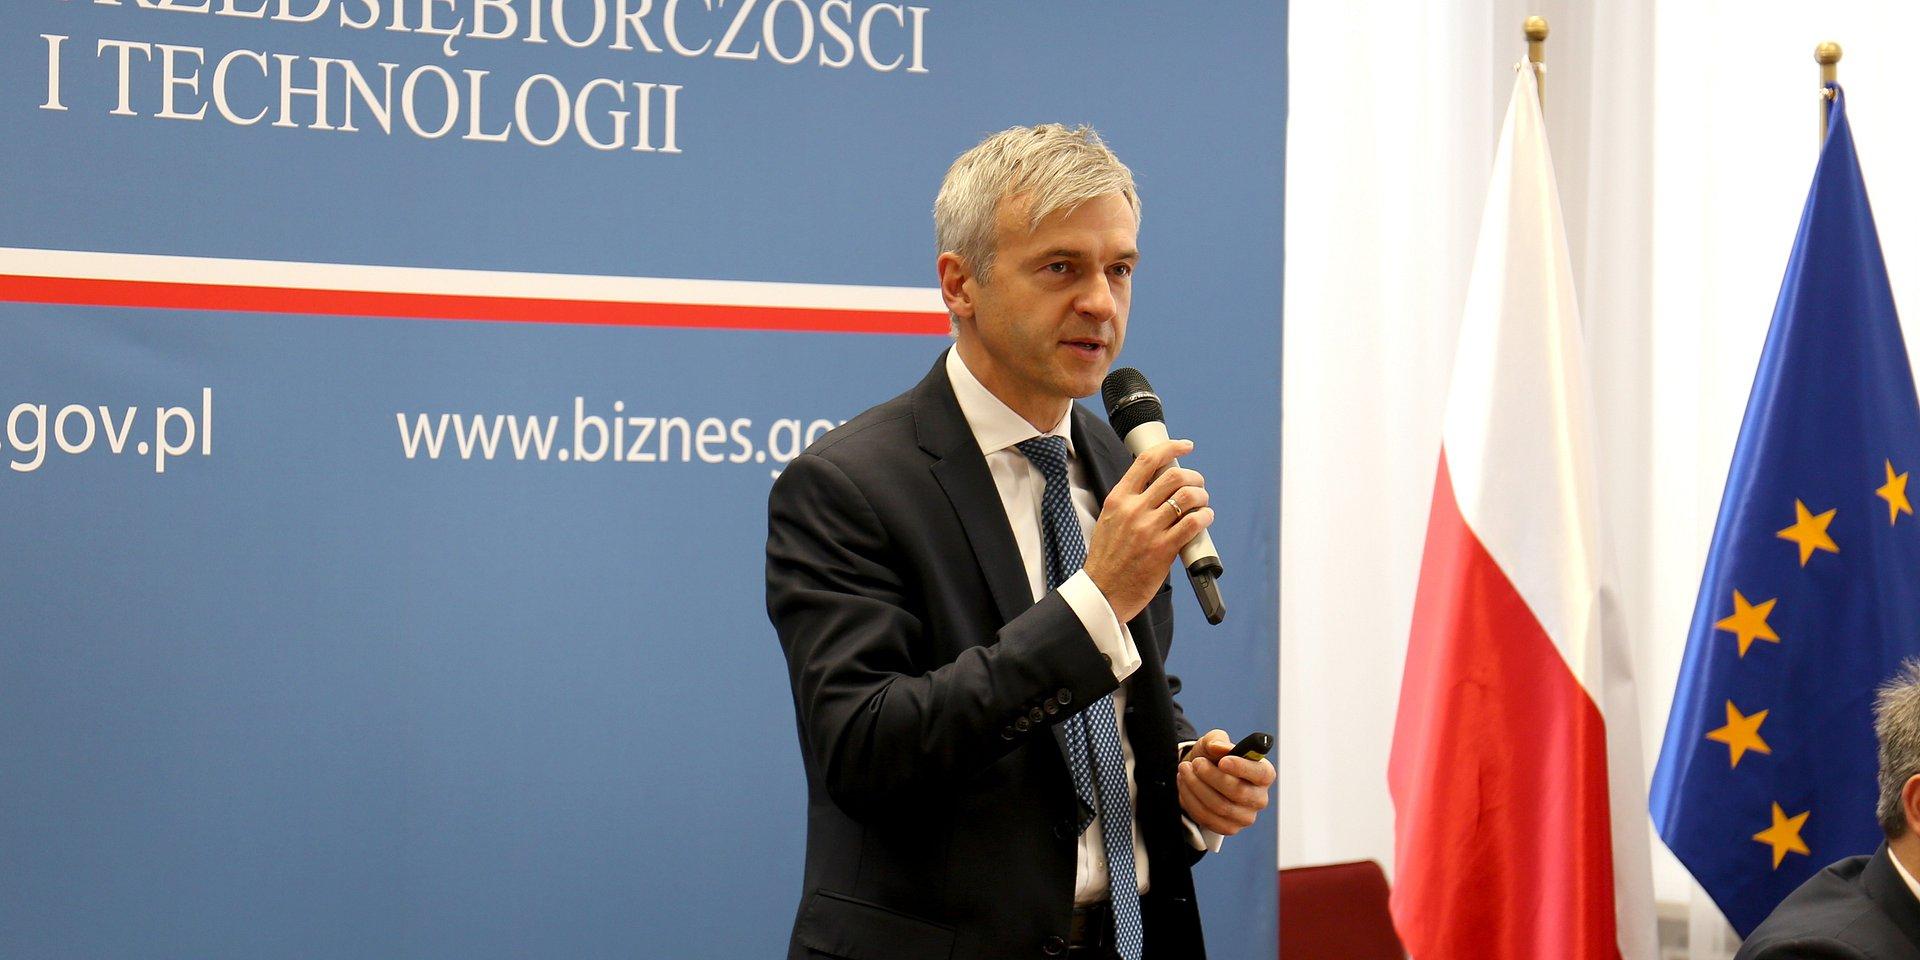 Akcelerator Eksportu Branży Meblarskiej już pracuje